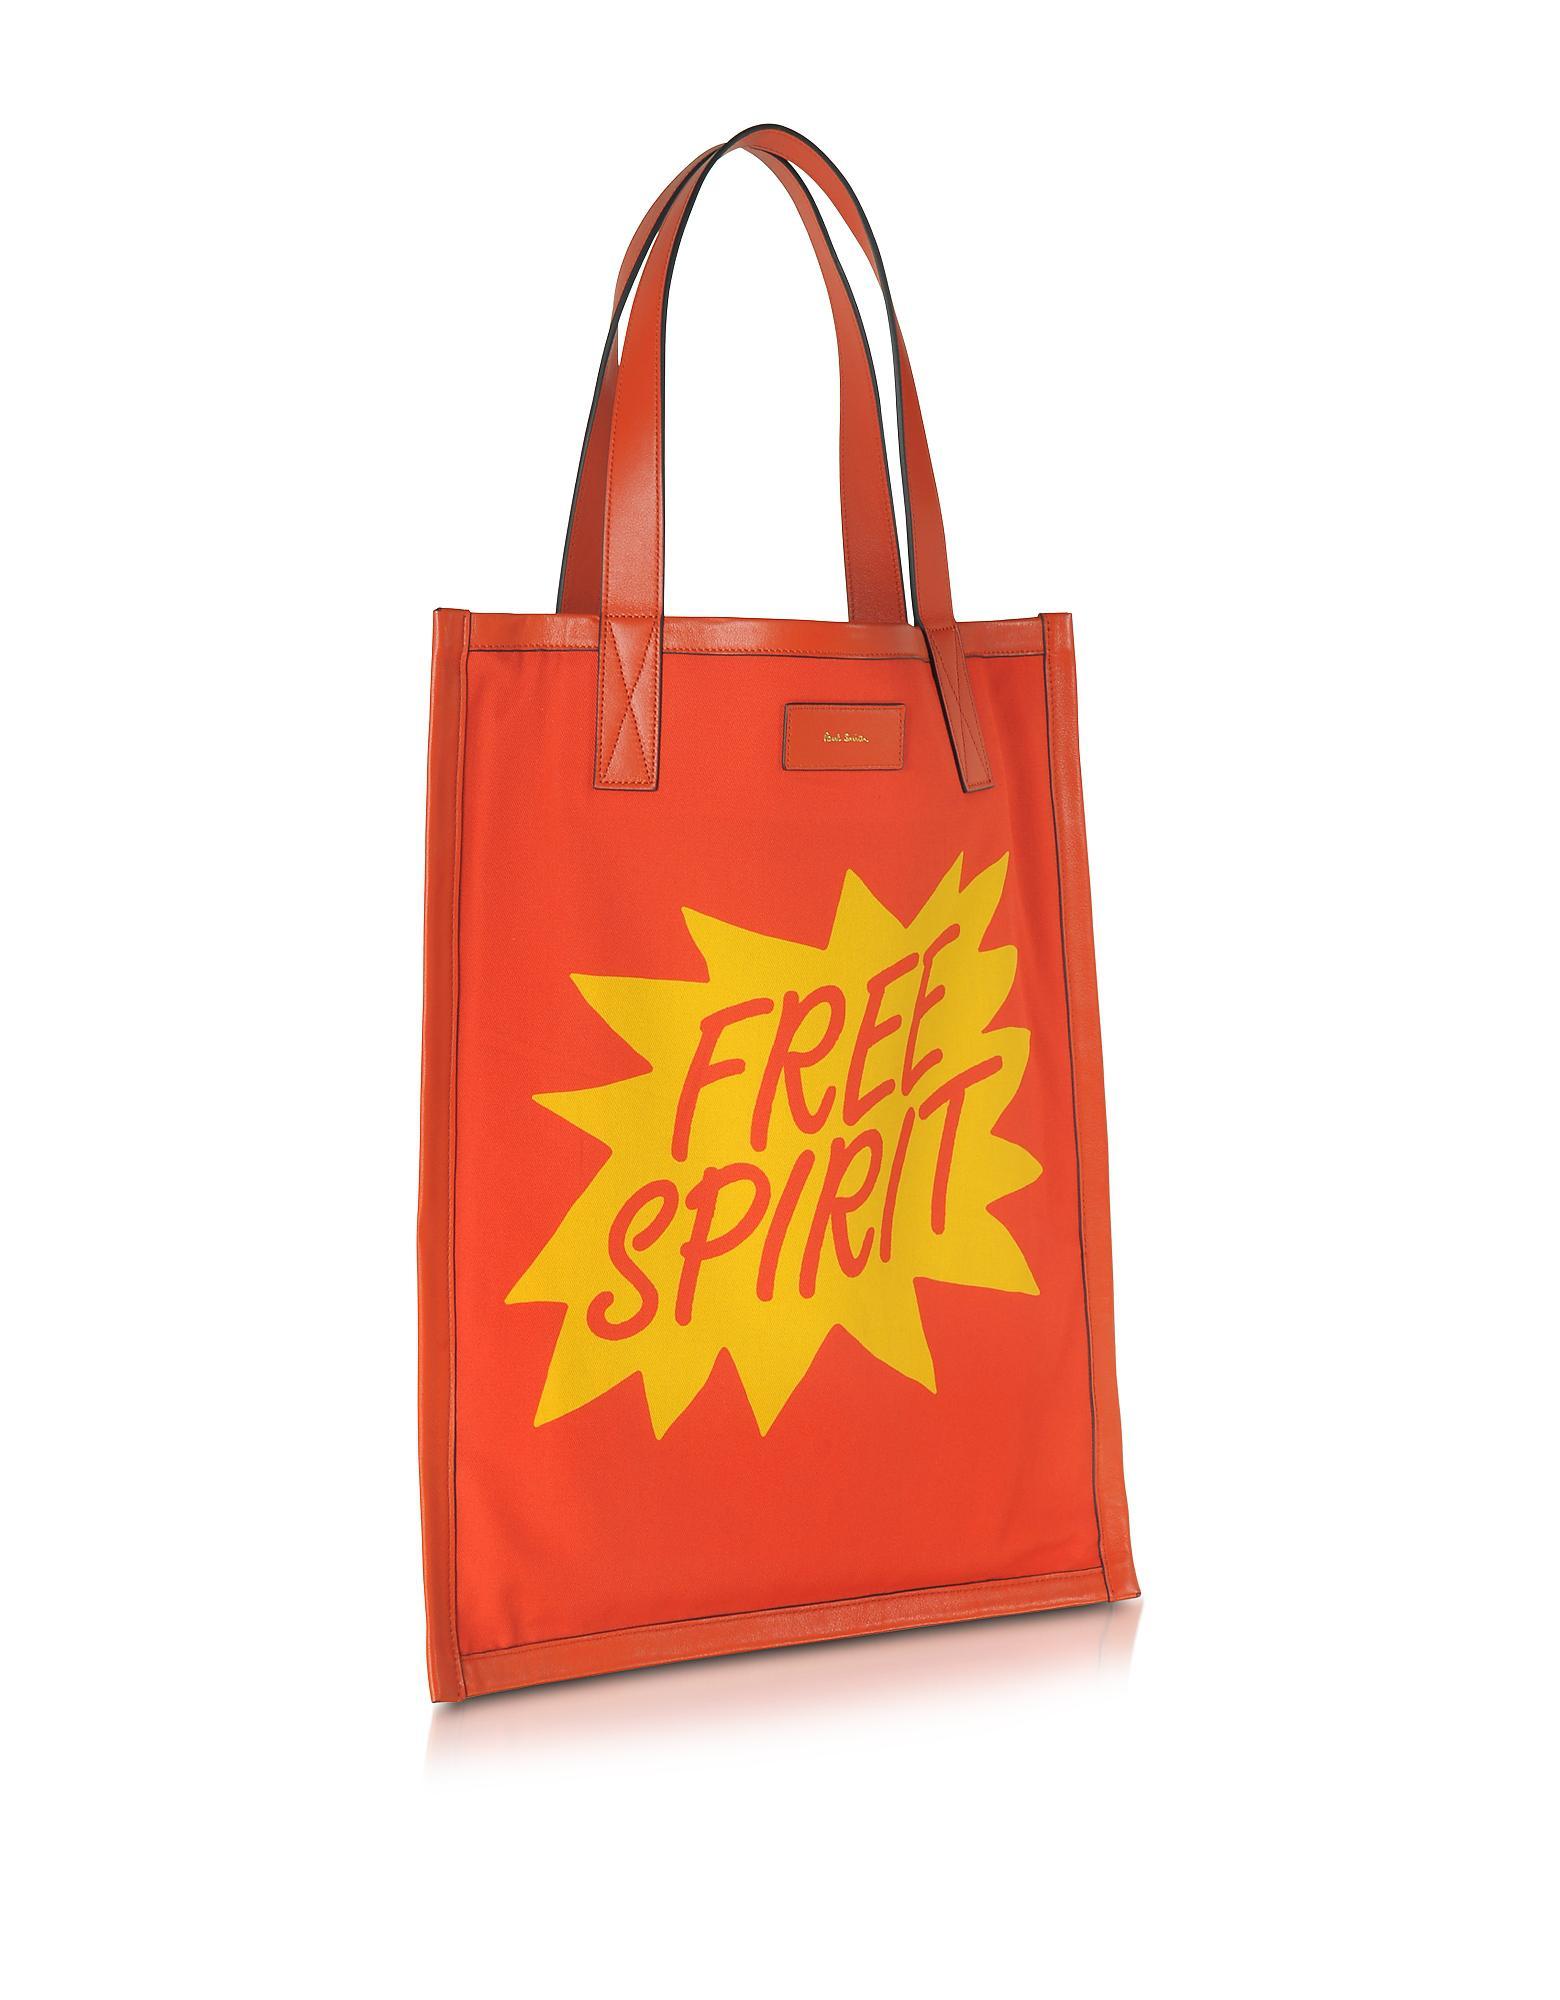 c06d3d2f56 Paul Smith Men's Orange And Yellow Free Spirit Print Tote Bag in ...